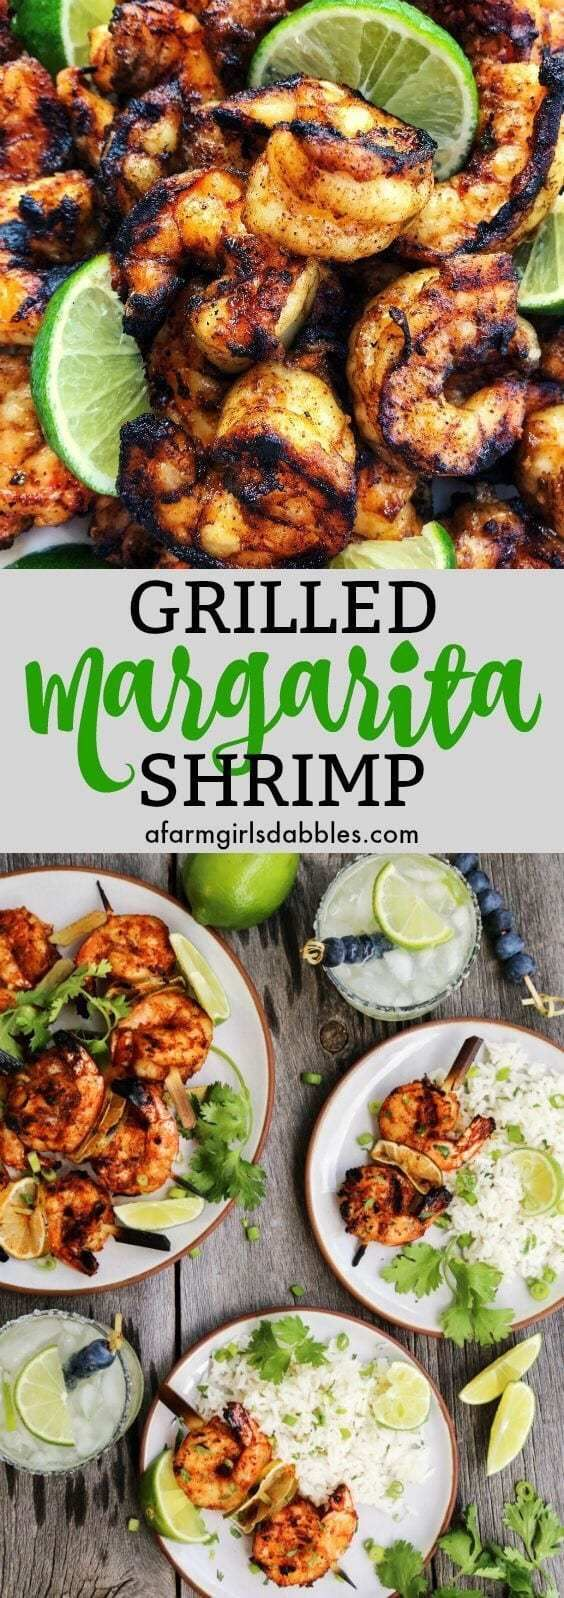 Photo of 18 Scrumptious Shrimp Recipes | Chief Health